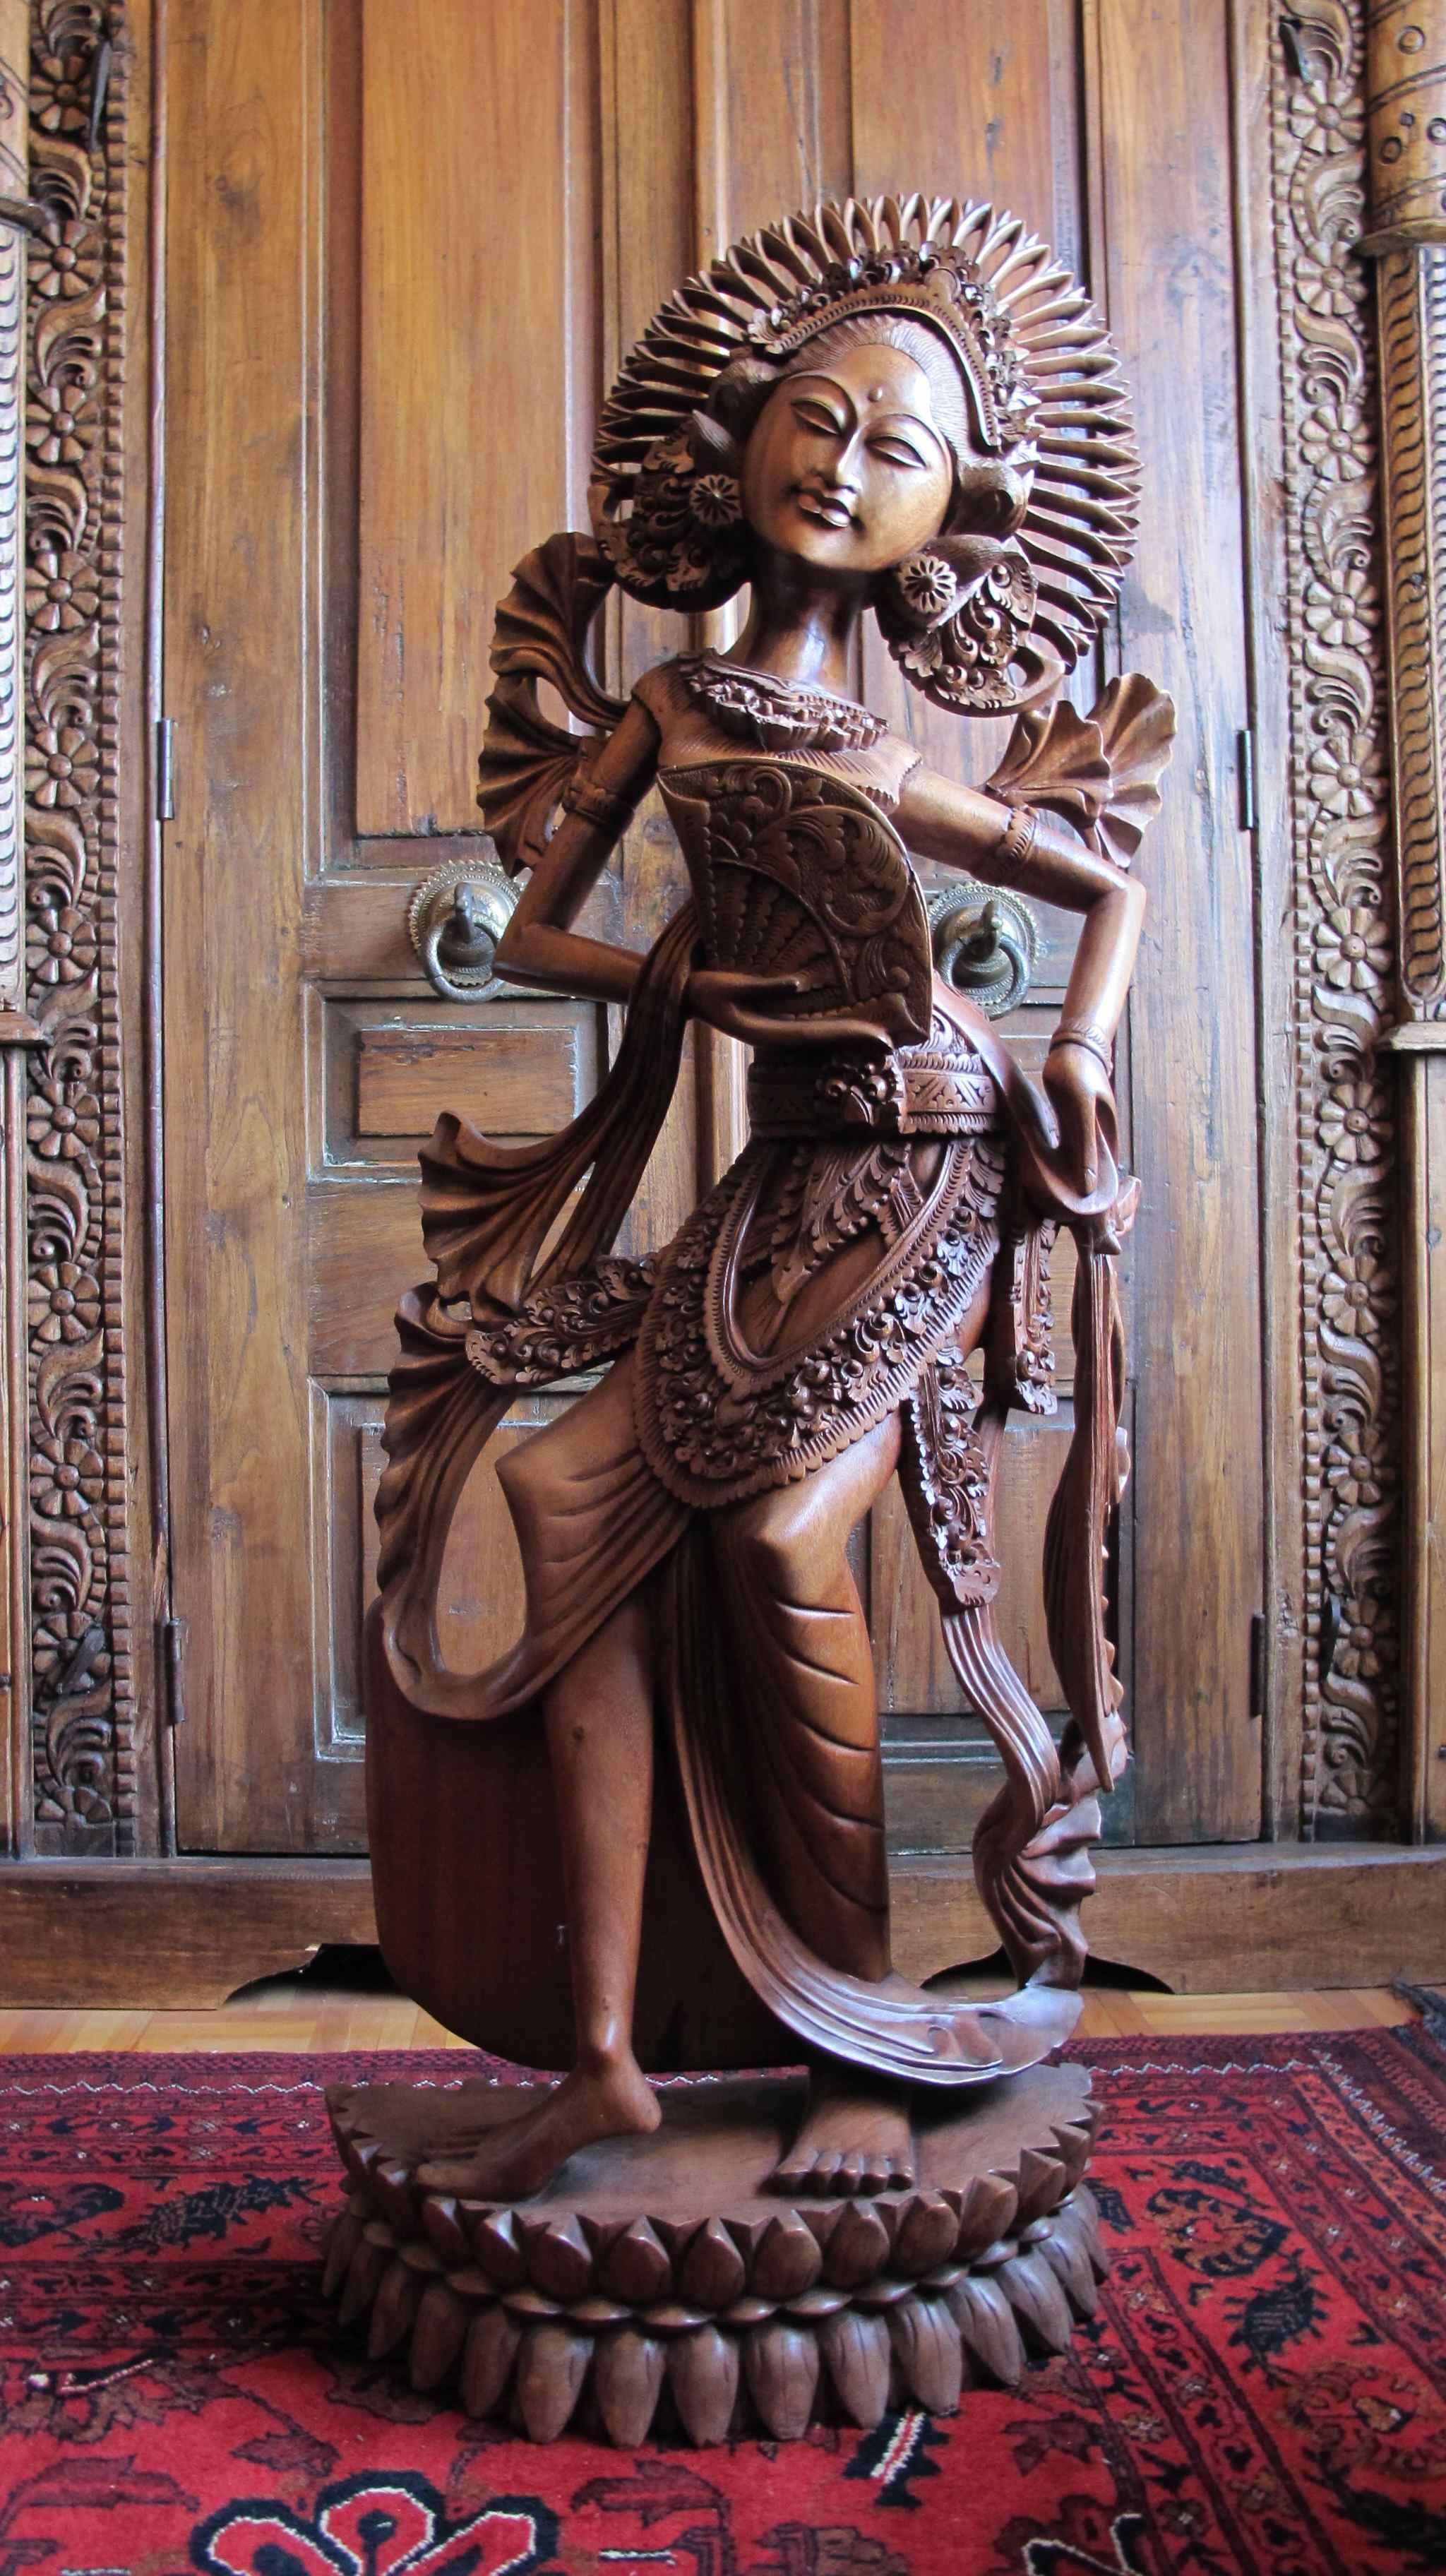 ACCUEIL importbali Statue, Indonesian art, Sculpture